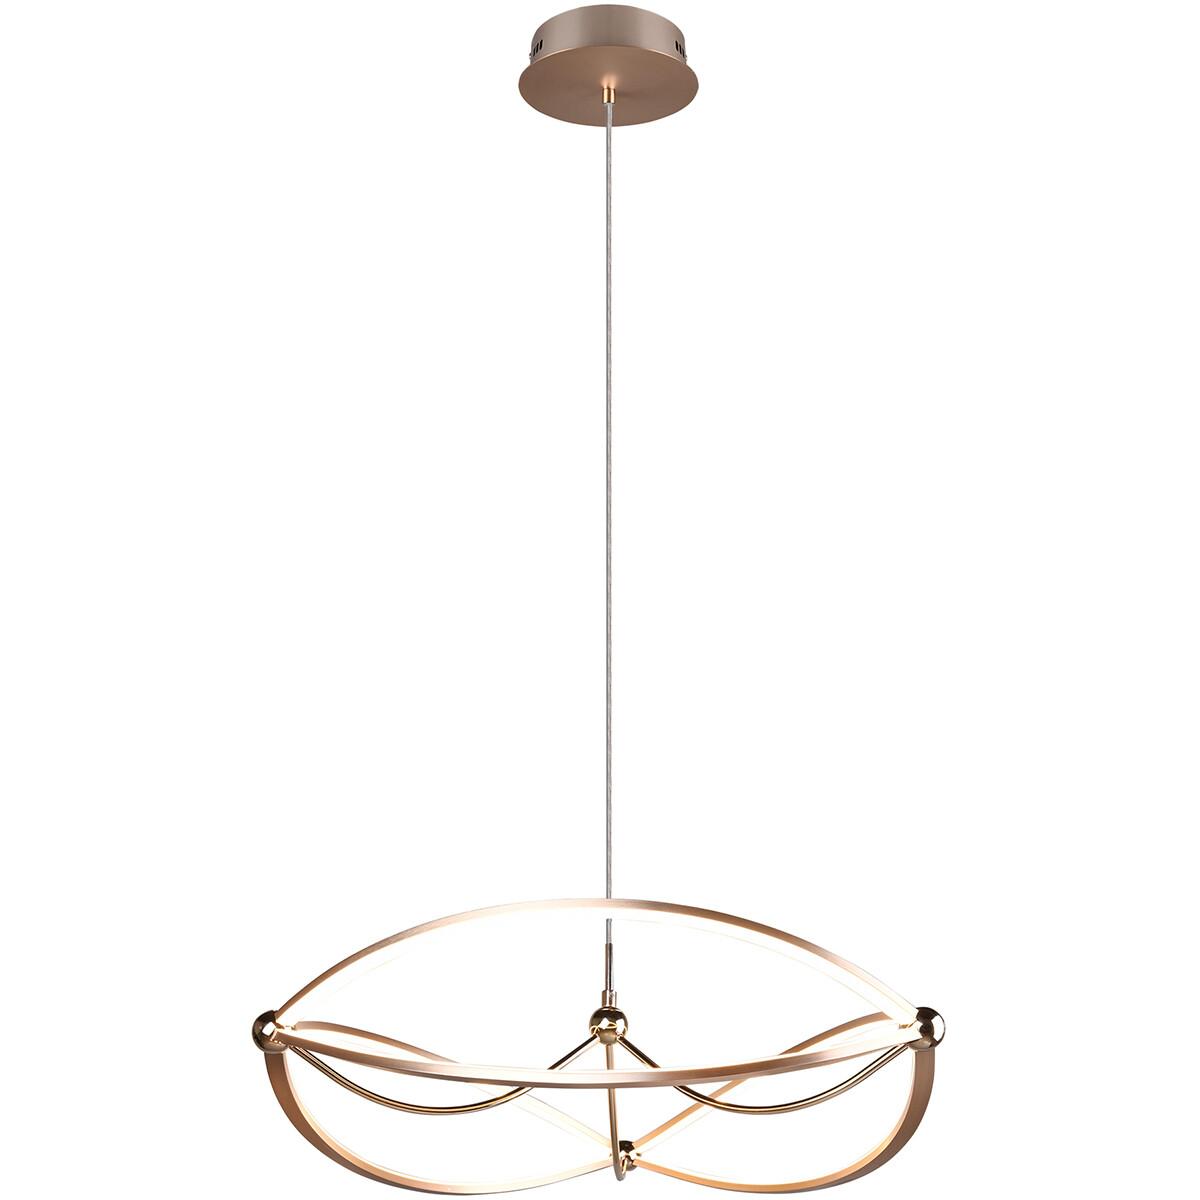 LED Hanglamp - Trion Charis - 42W - Warm Wit 3000K - Dimbaar - Rond - Mat Goud - Aluminium